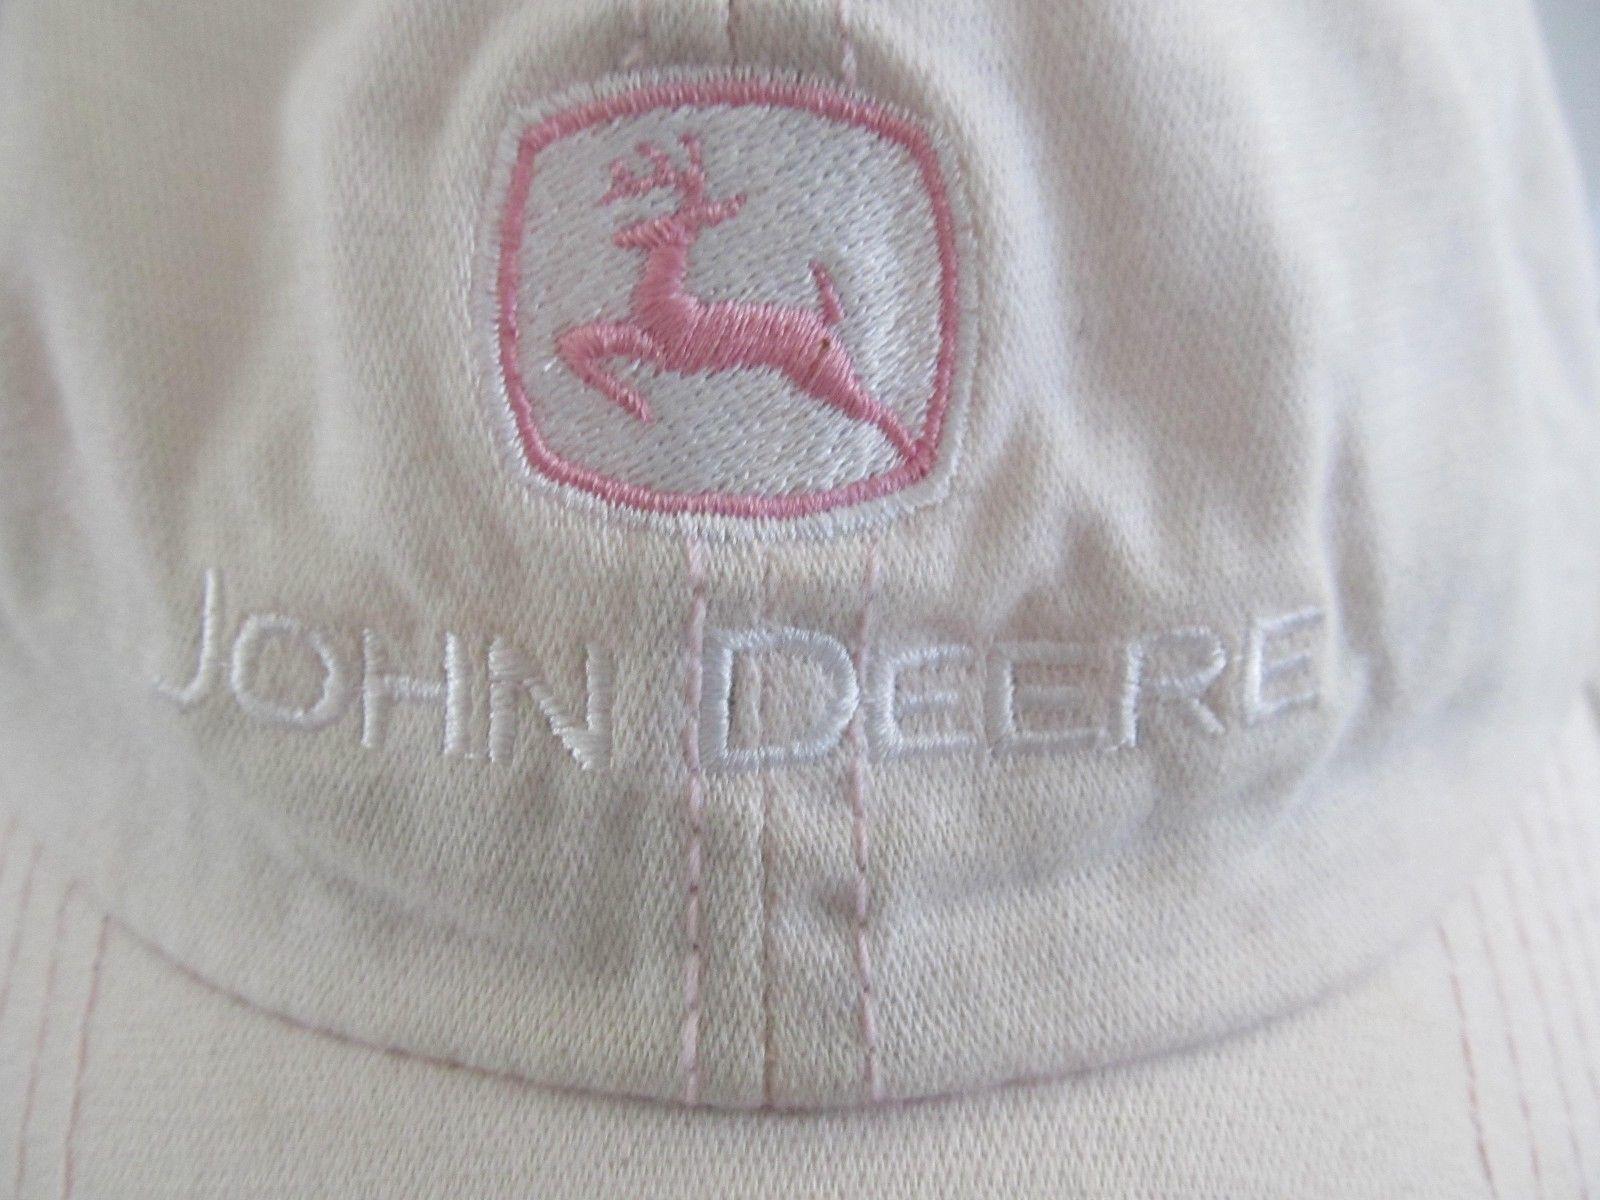 John Deere Pink w/ Black Underbill Embroidered Logo Adj Distressed Ball Cap Hat